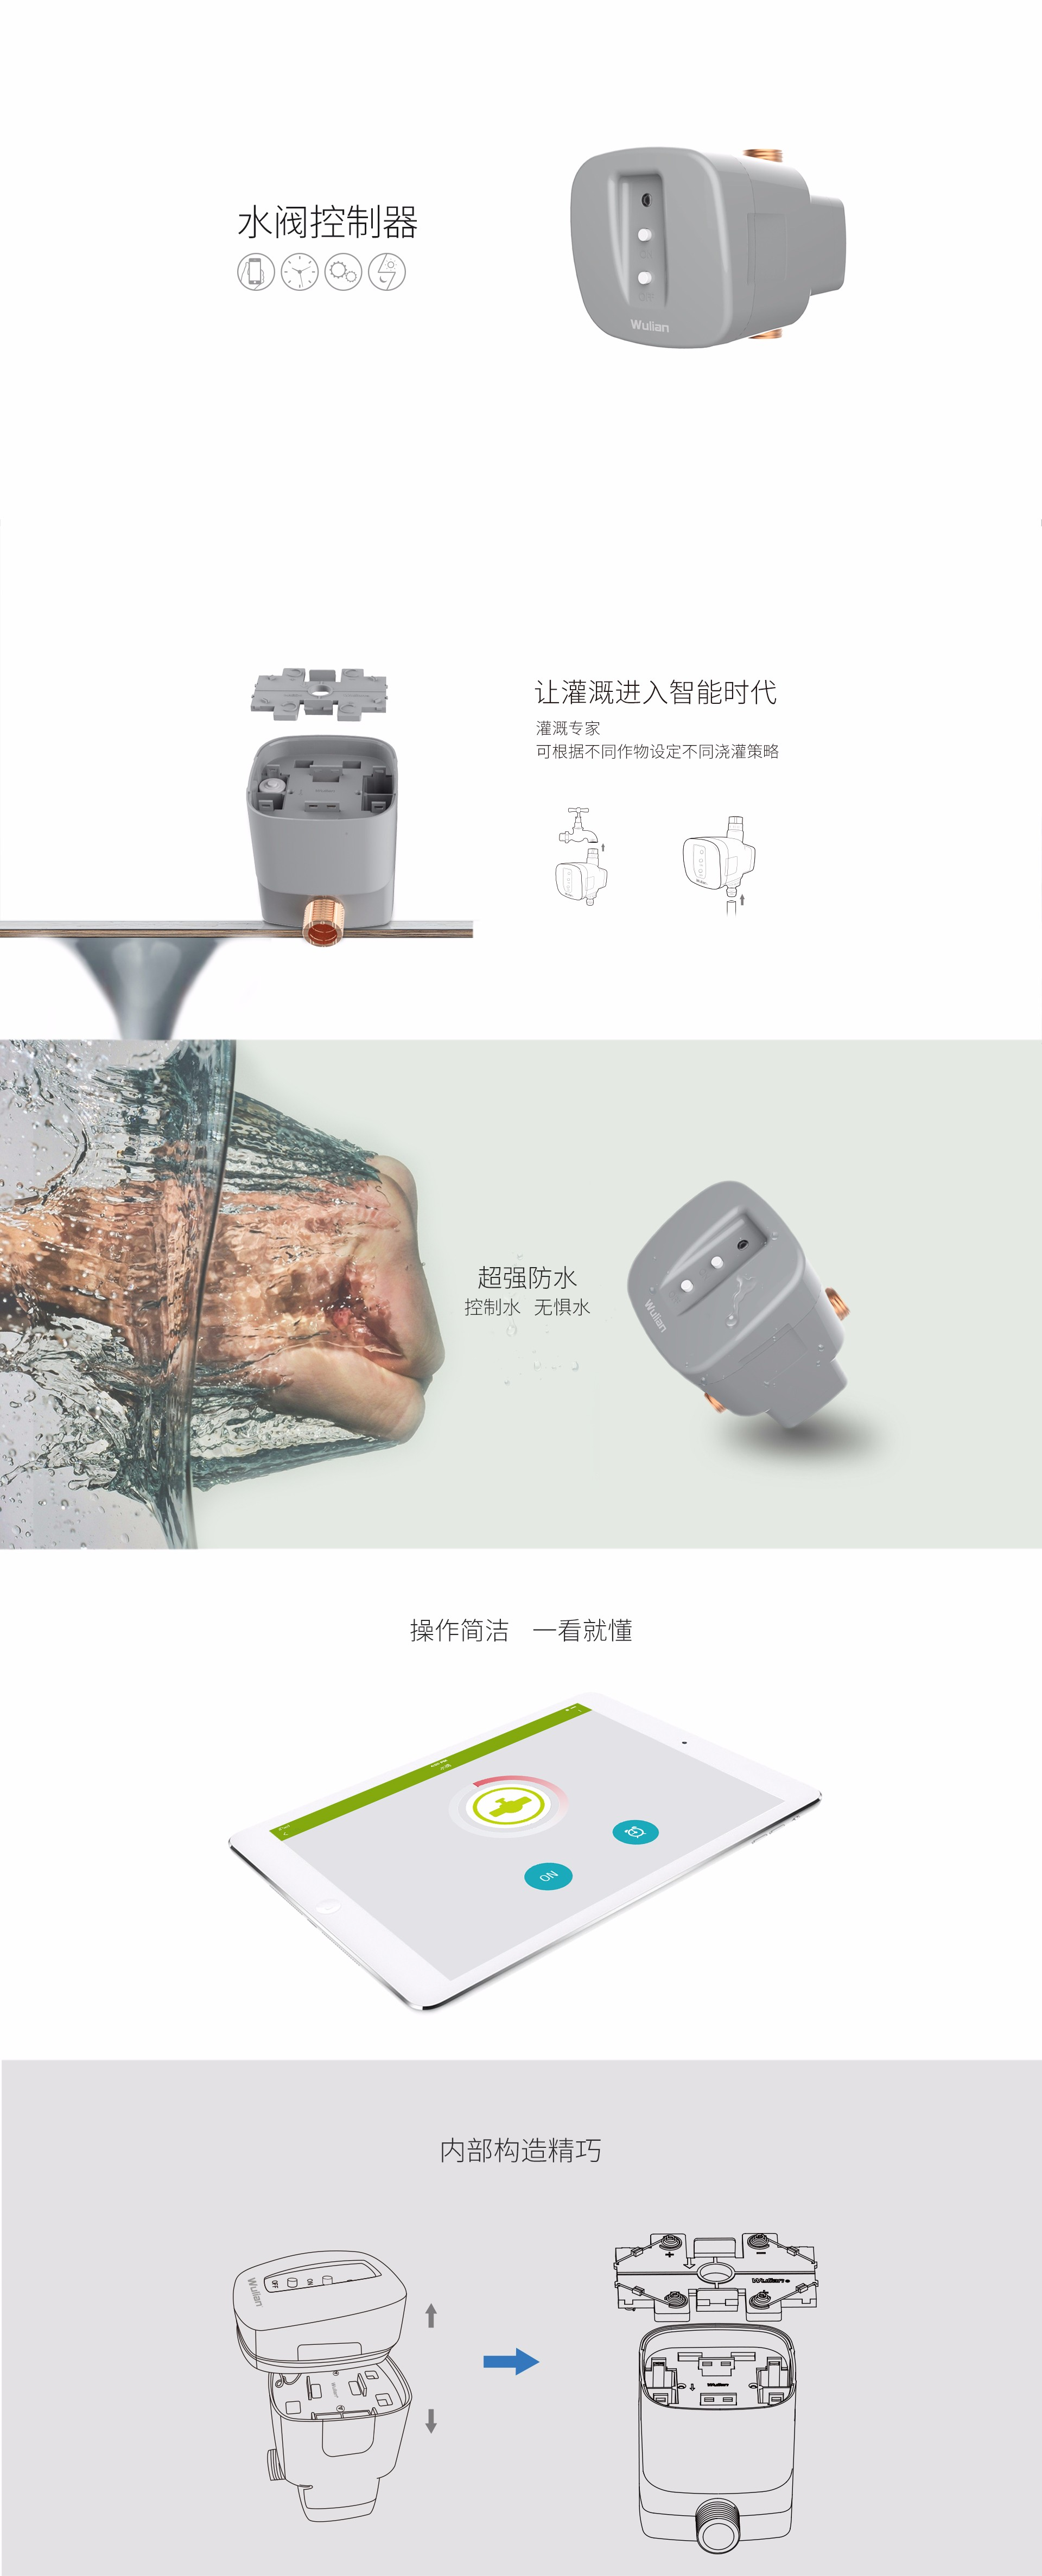 WL-水阀控制器.jpg